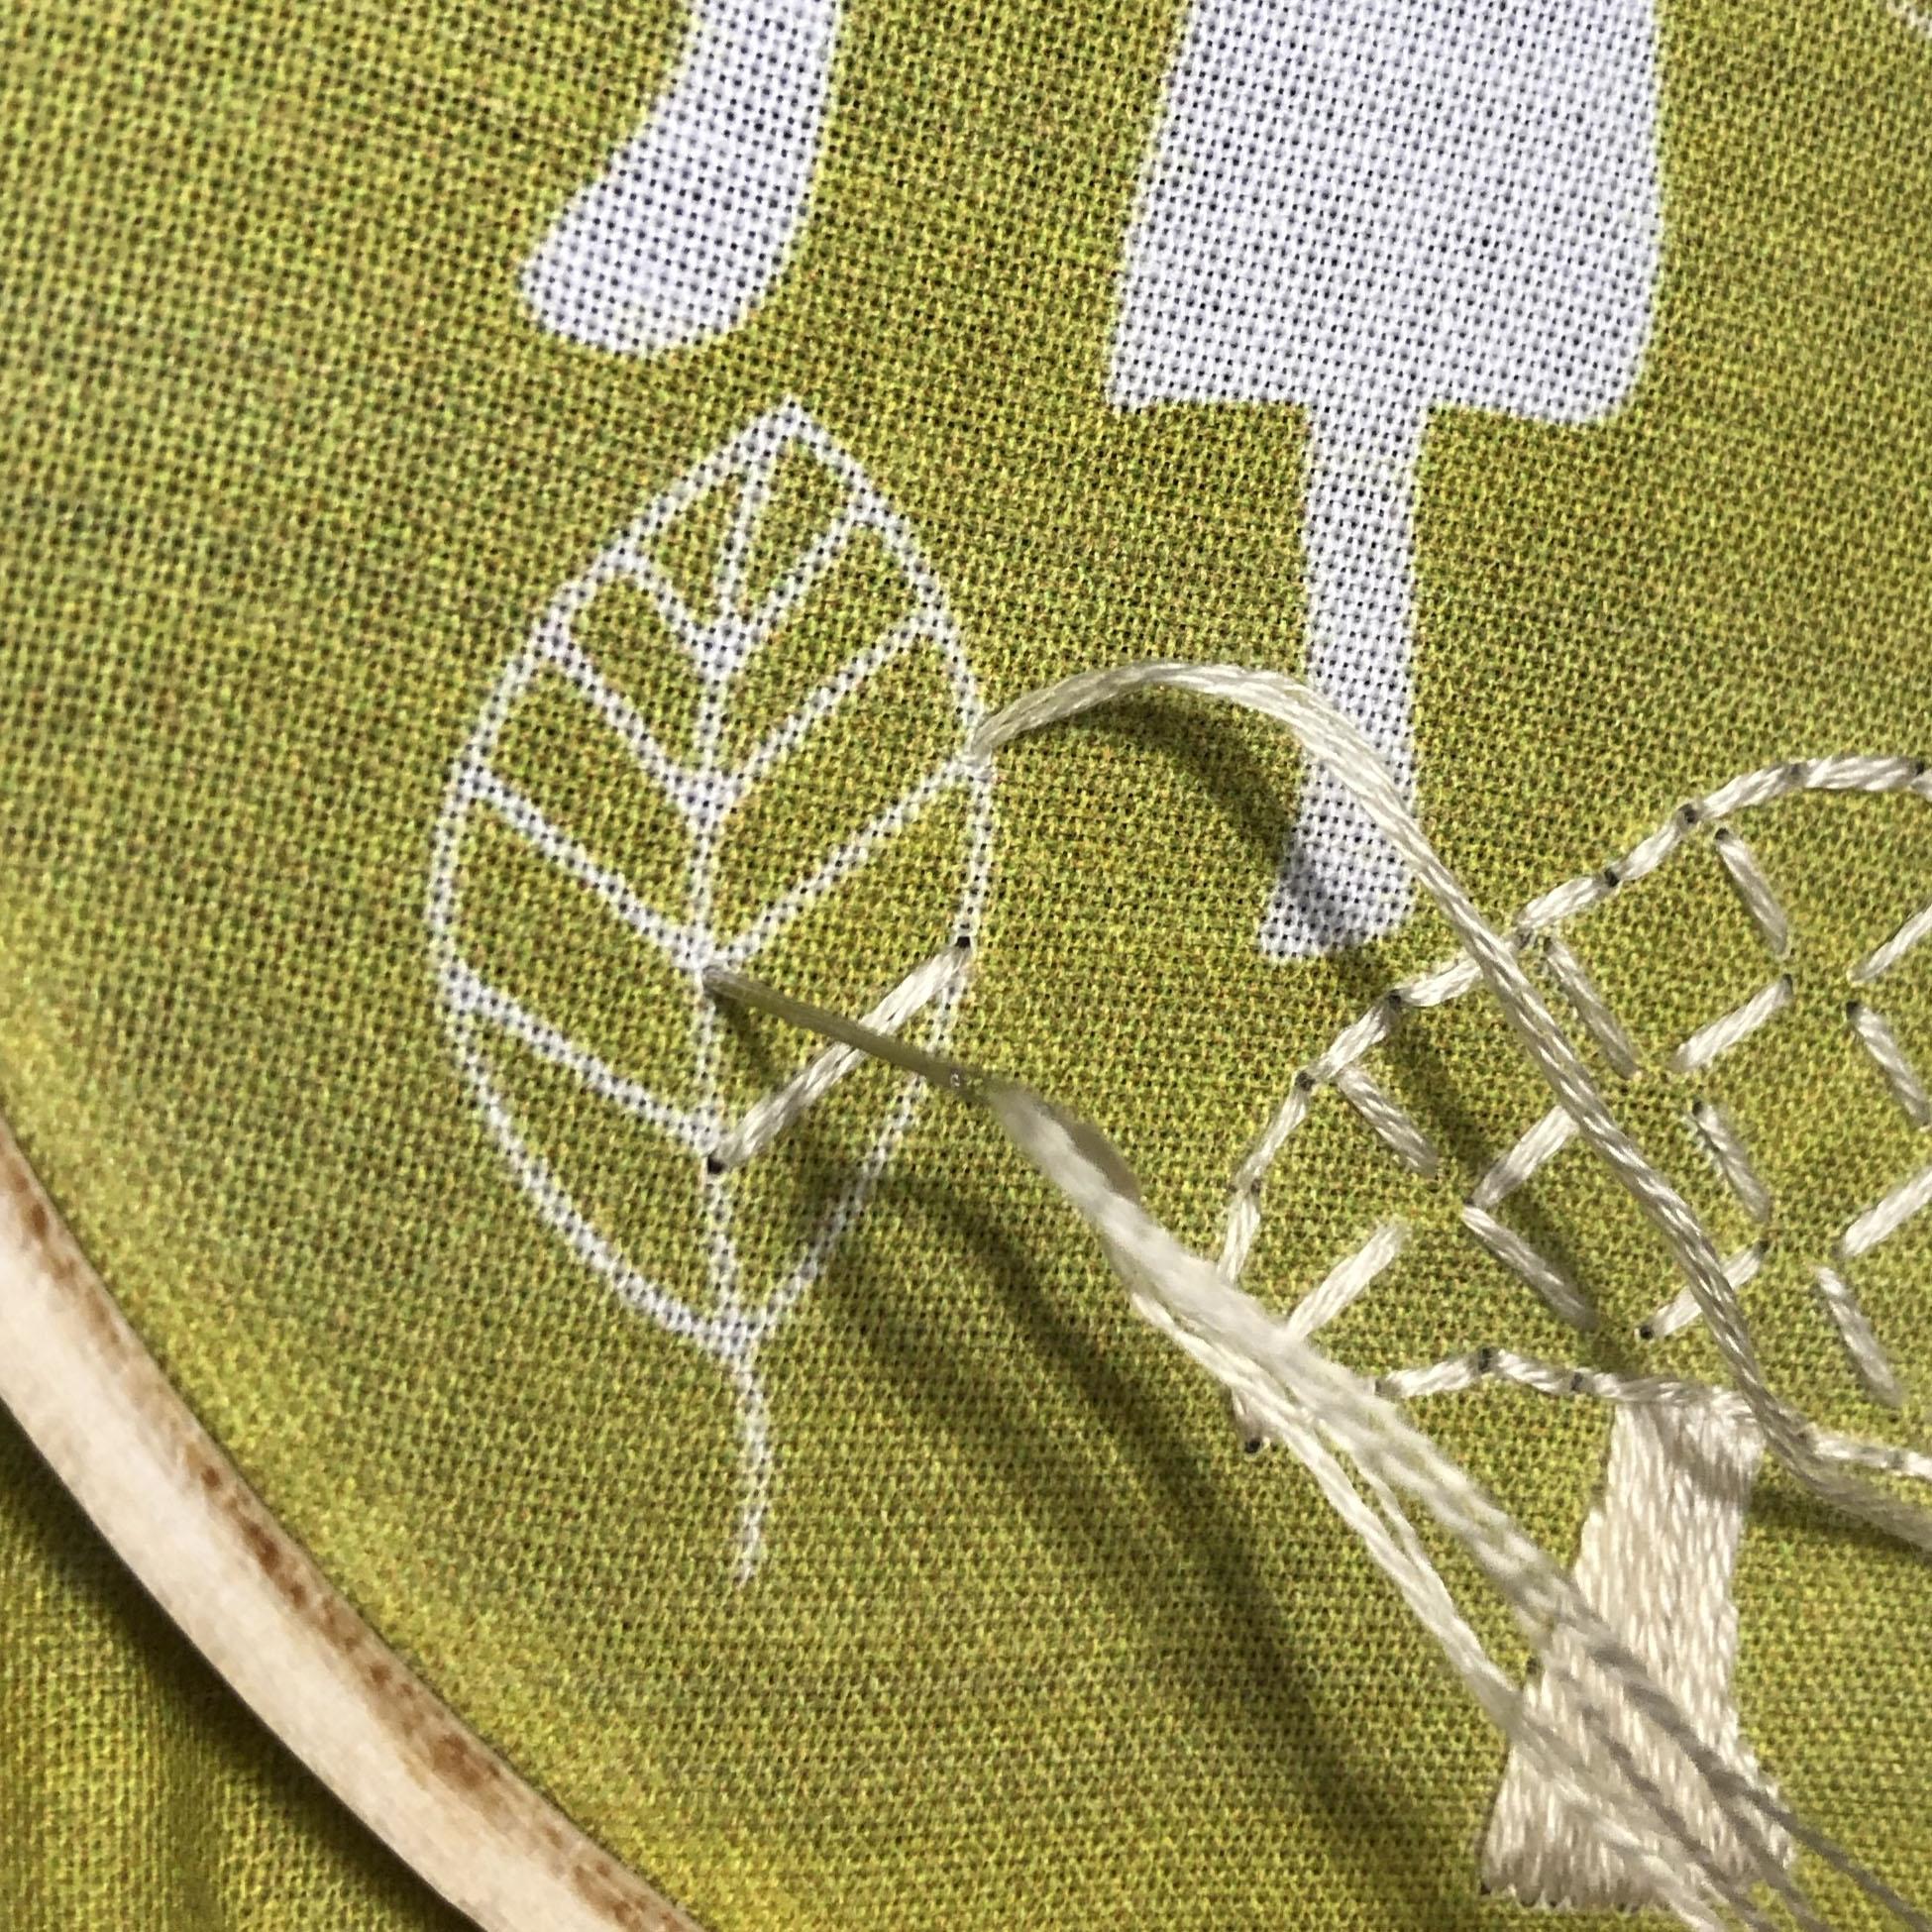 Single stitch for veins